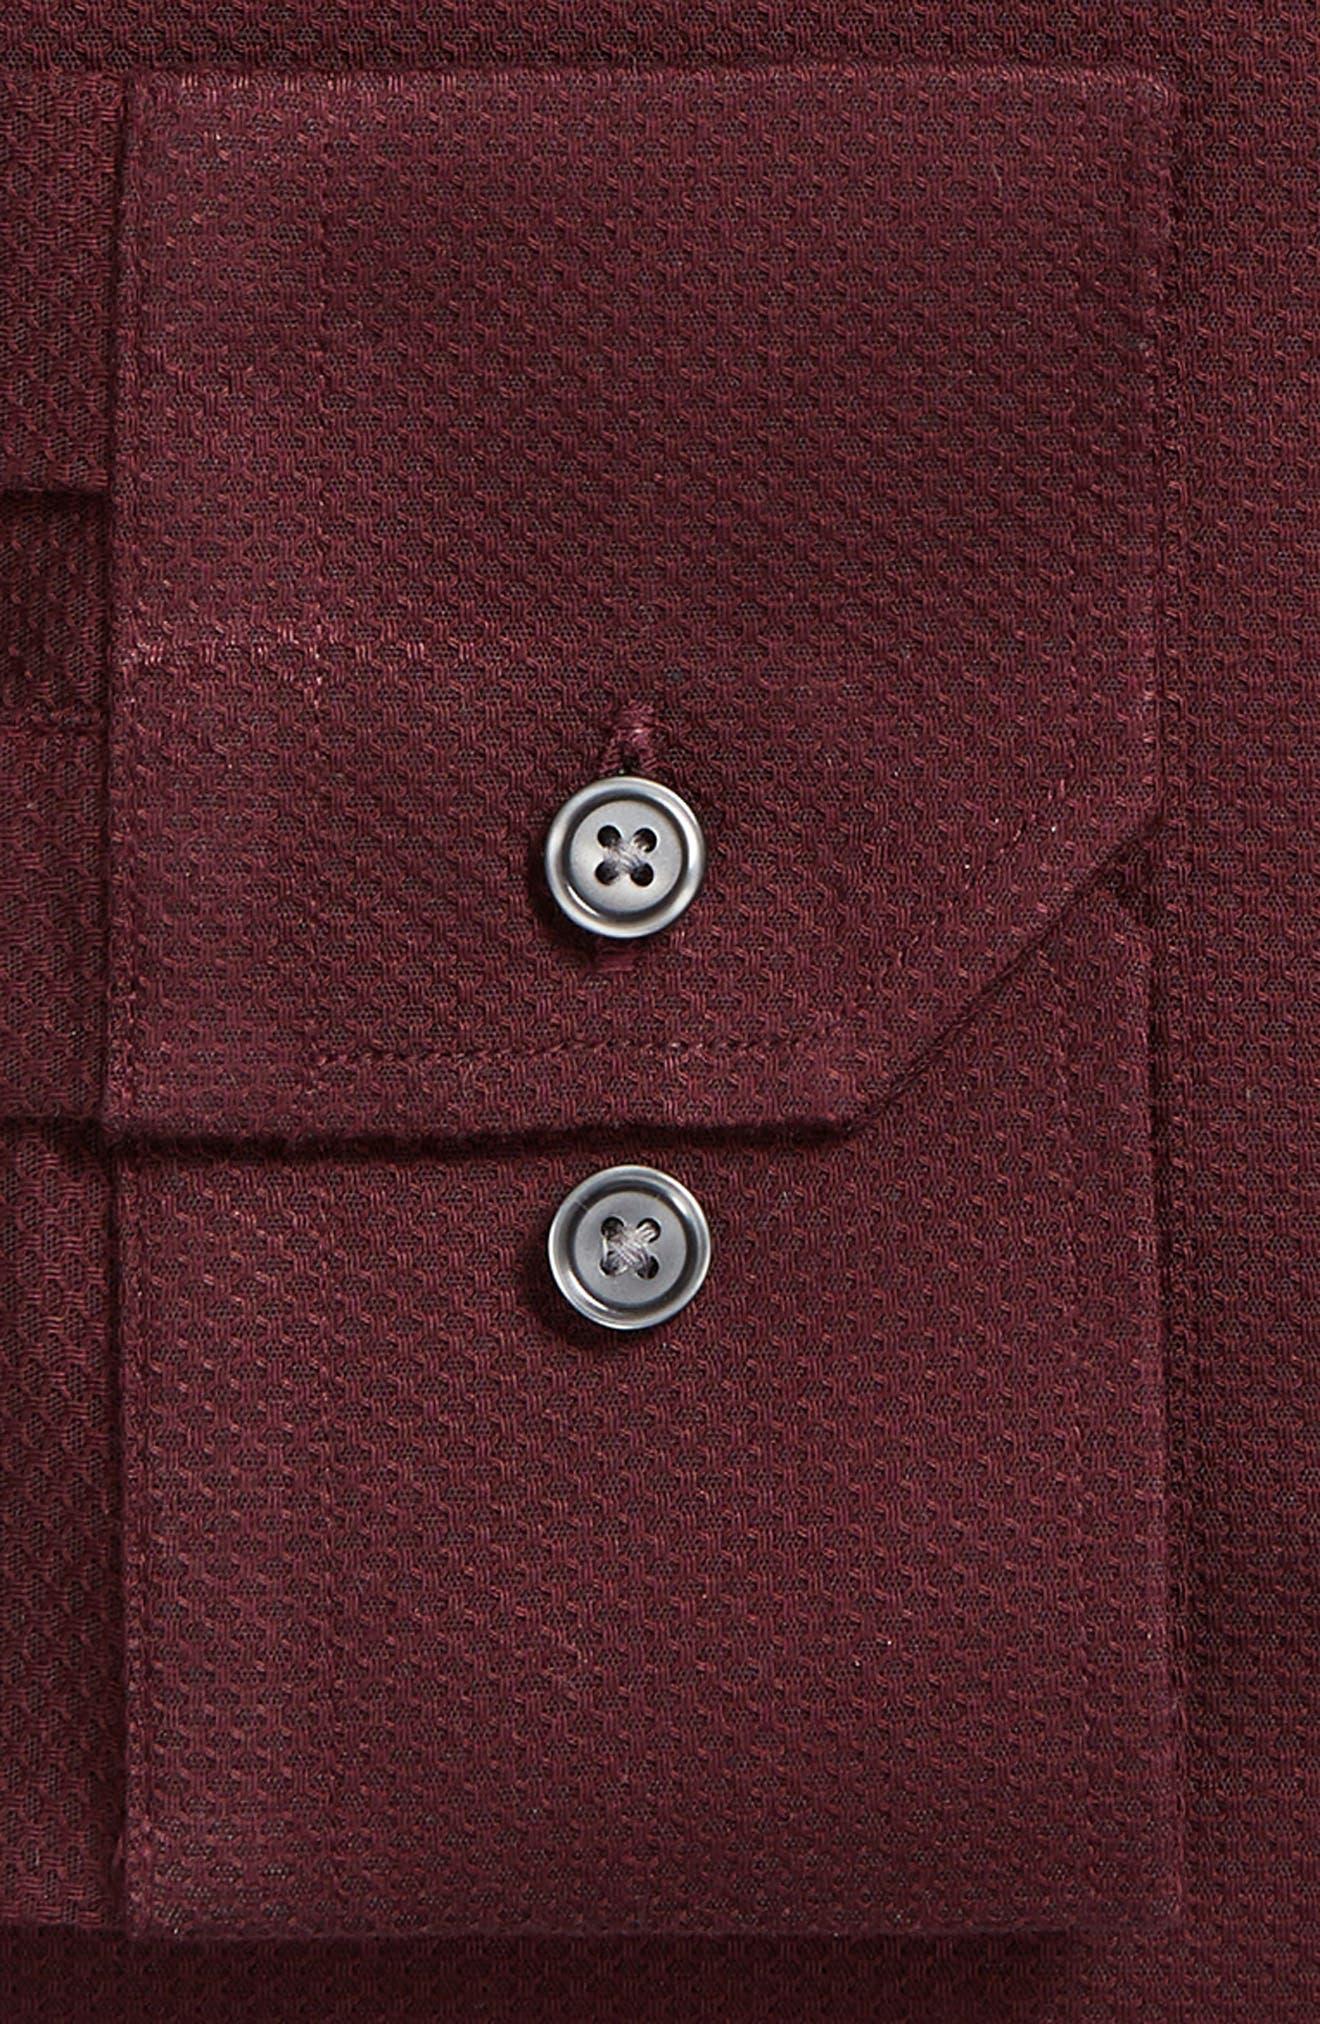 Trim Fit Non-Iron Solid Dress Shirt,                             Alternate thumbnail 6, color,                             BURGUNDY ROYALE